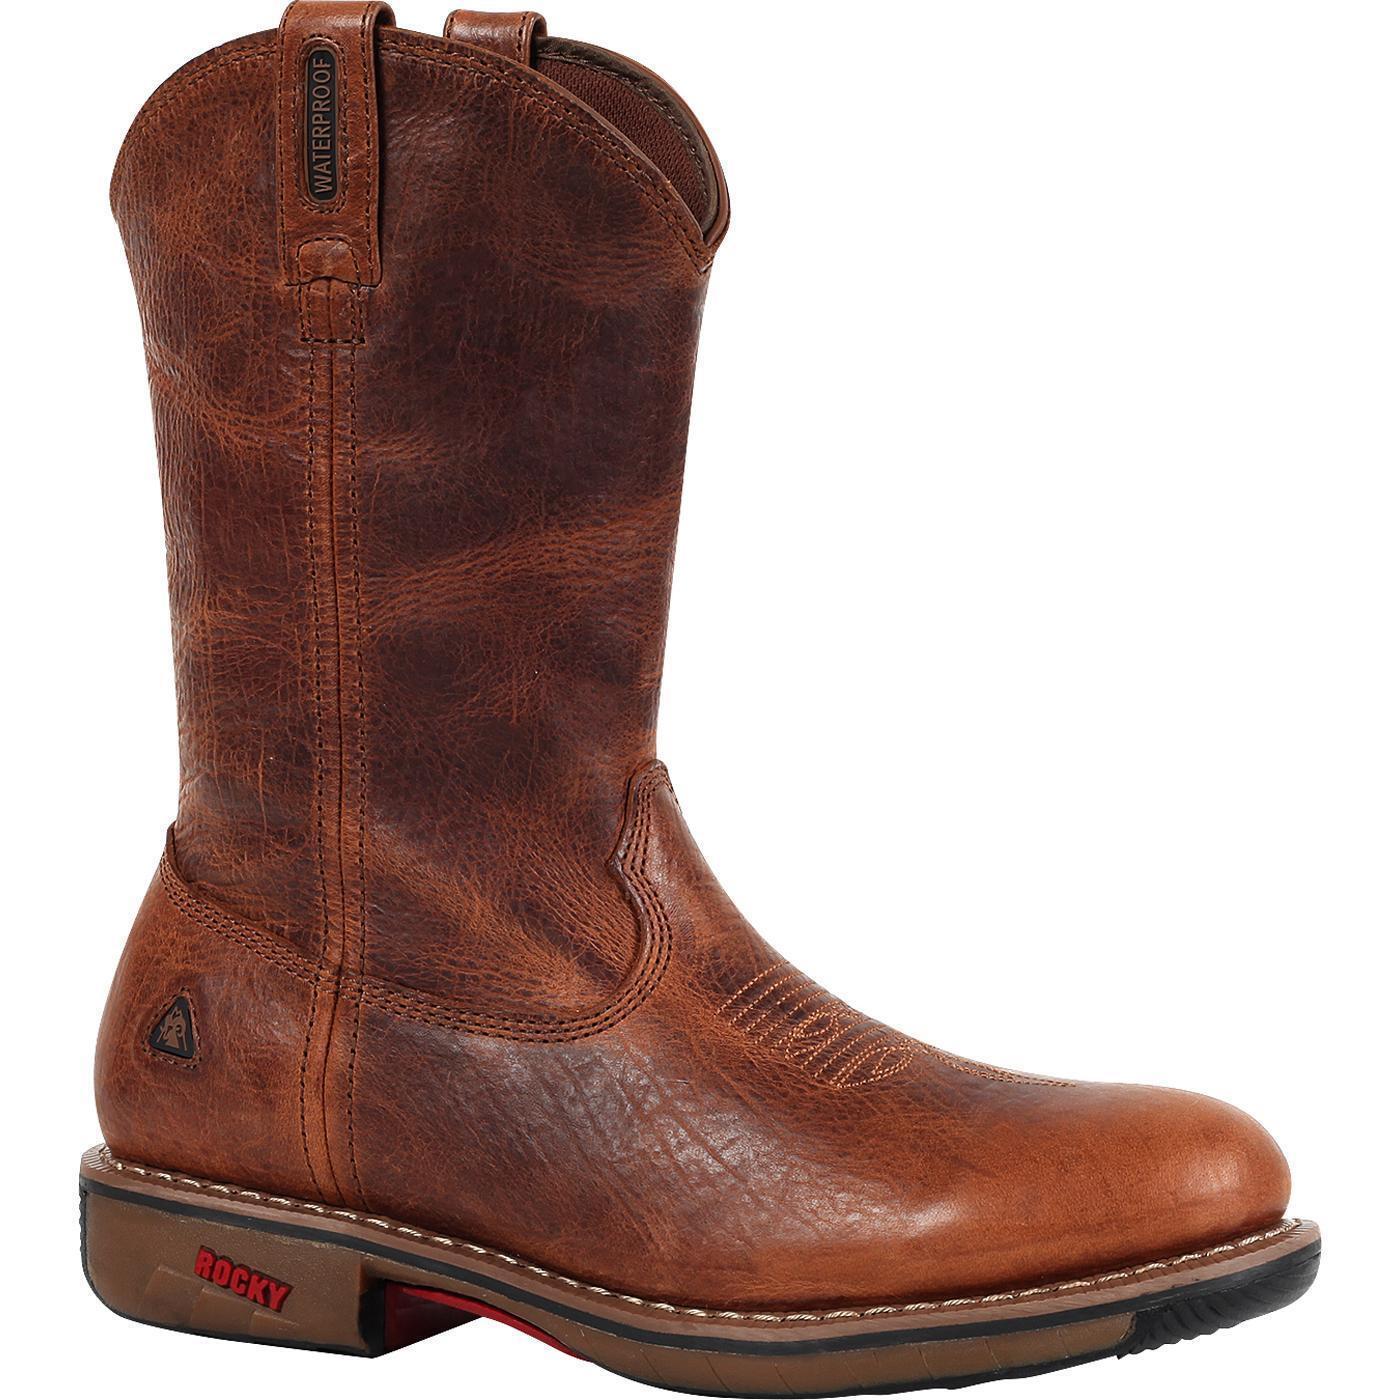 Rocky Ride Para Hombre botas Impermeables occidental Marrón Puntera De Acero FQ0006181